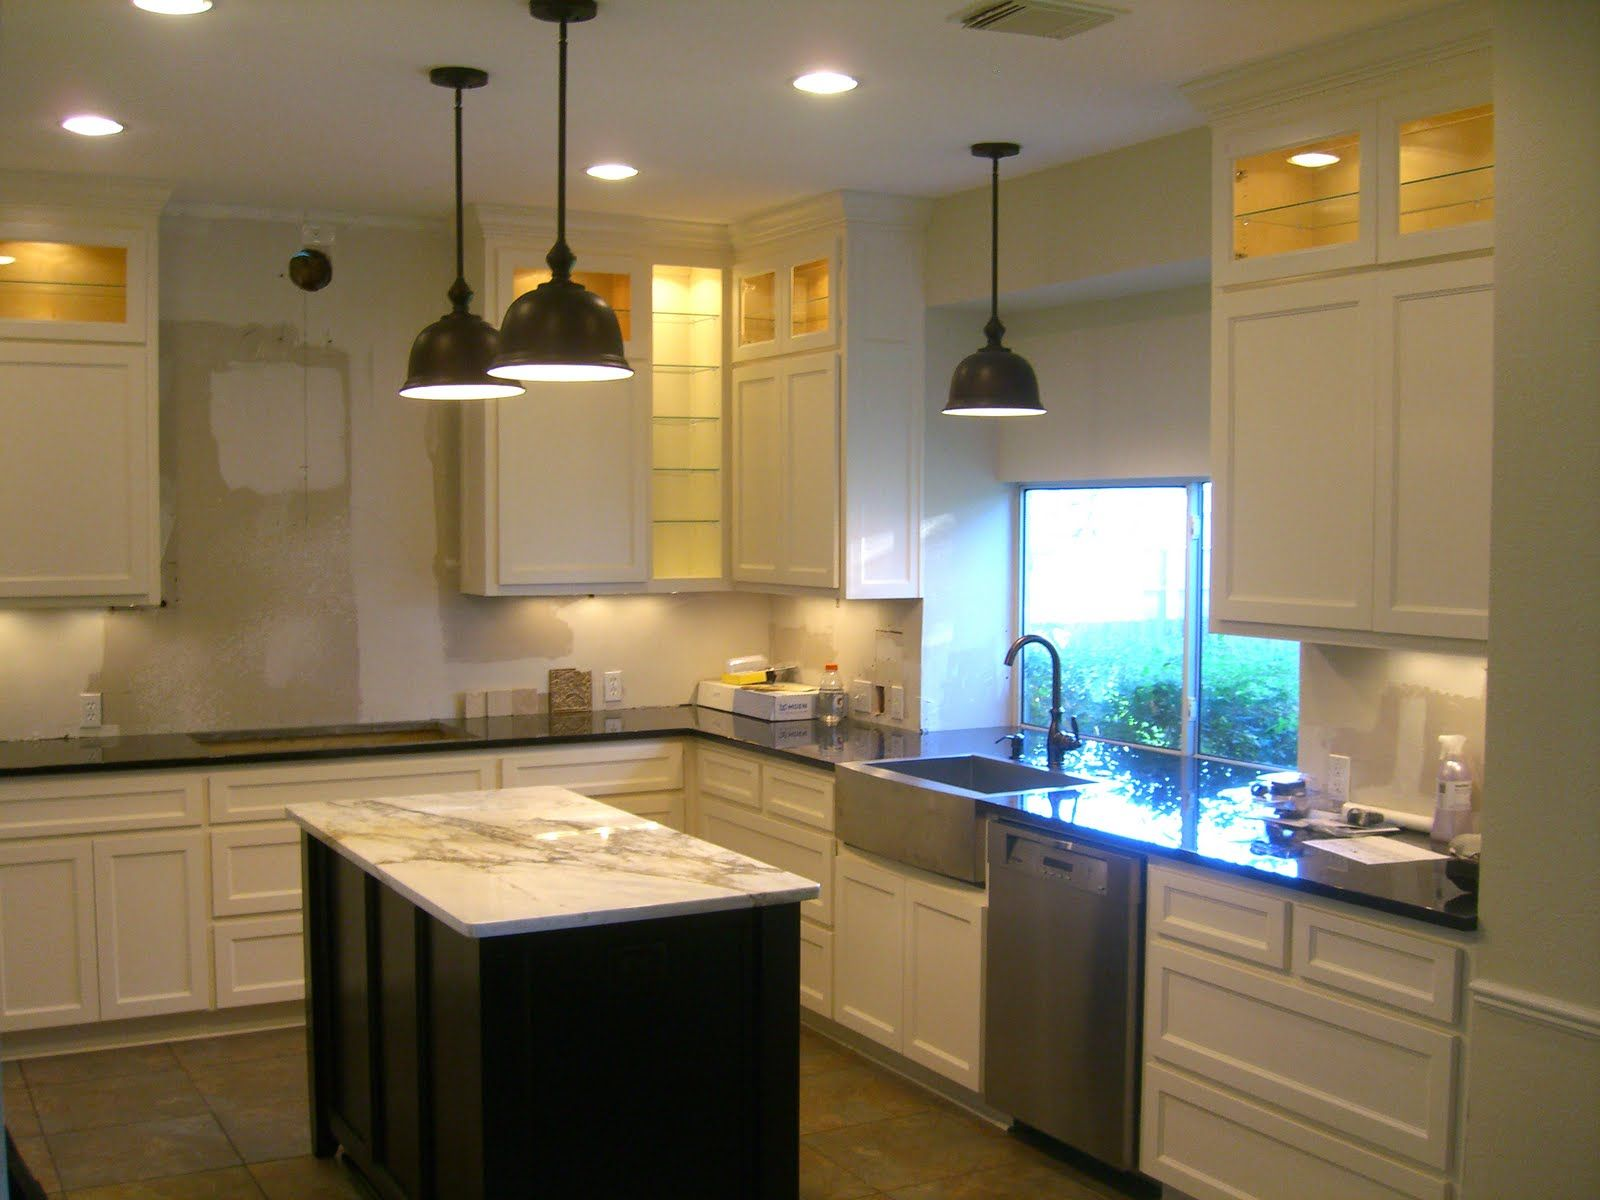 Overhead Küche Beleuchtung | Küche | Pinterest | Beleuchtung und Küche